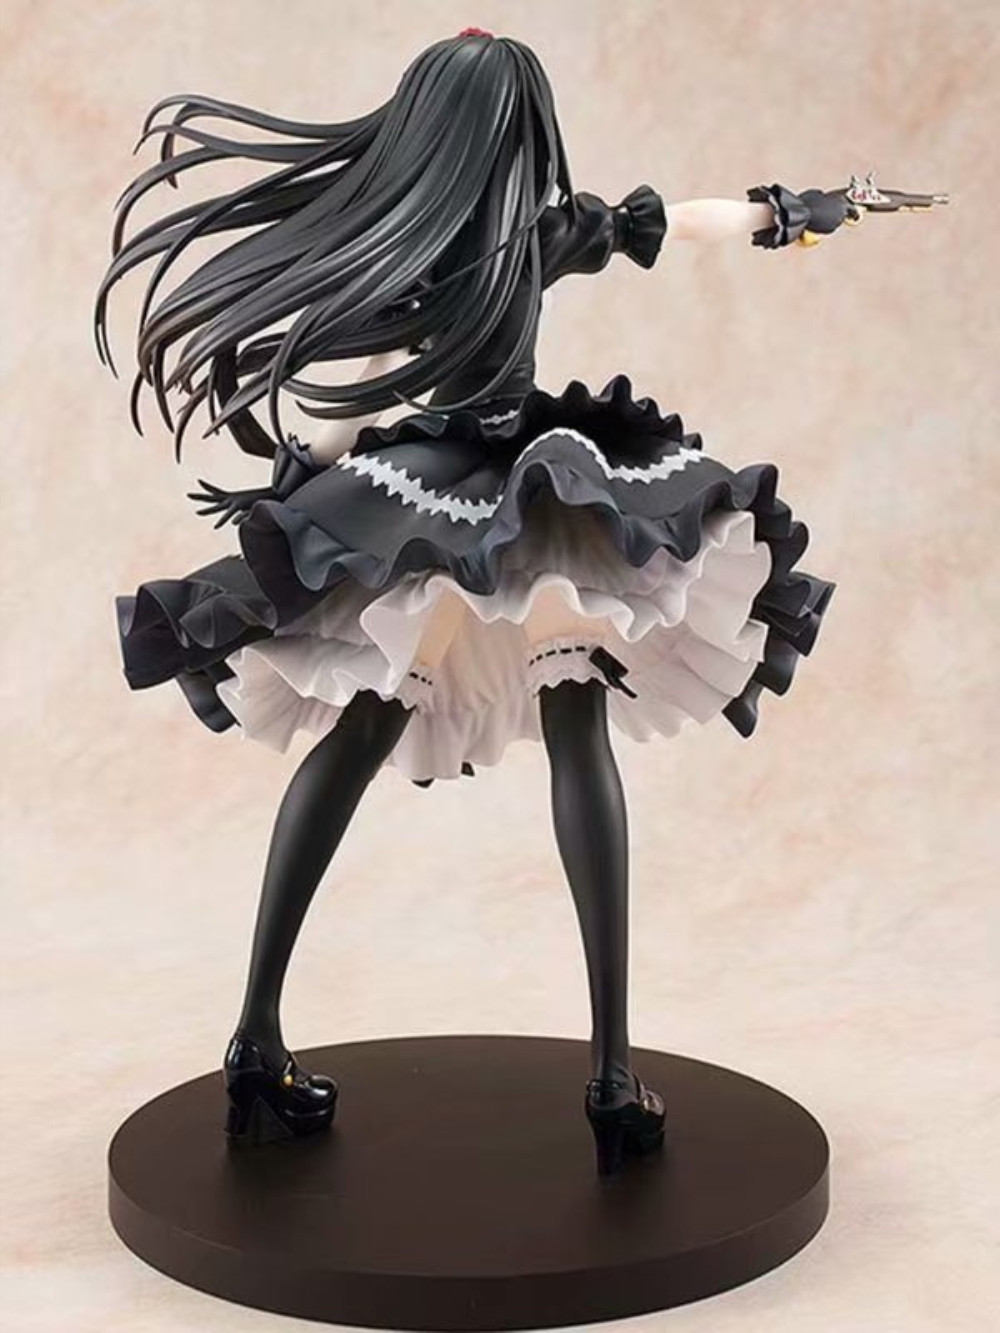 Anime Date A Live Nightmare Tokisaki Kurumi Action Figure Fantasia 30th Anniversary Figurine PVC Model Doll Girl Gift Toys PM 3